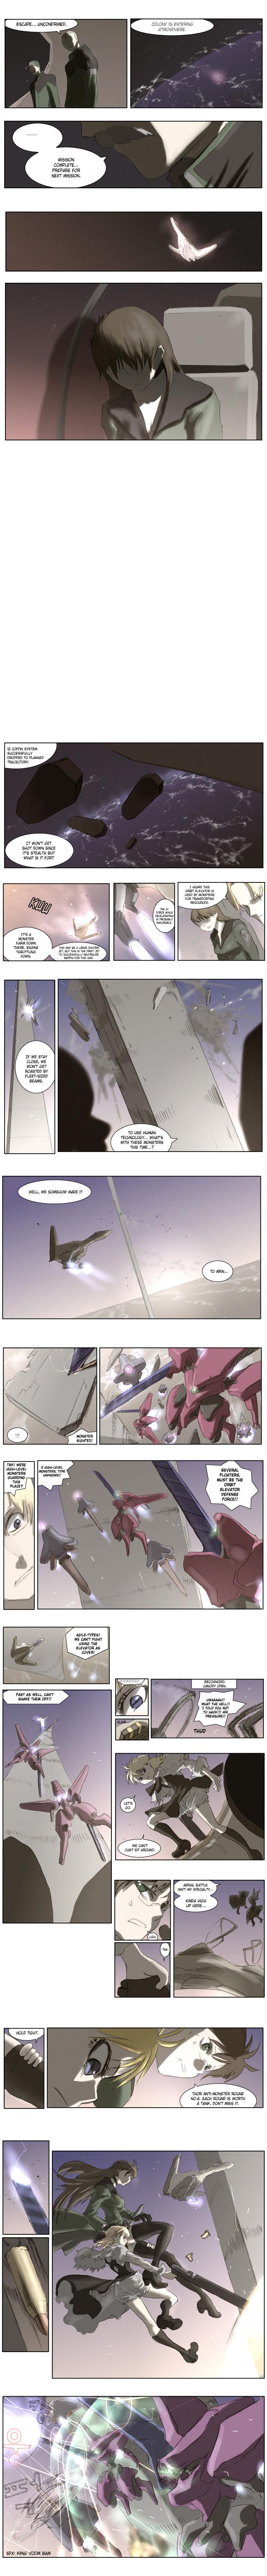 Knight Run 40 Page 2